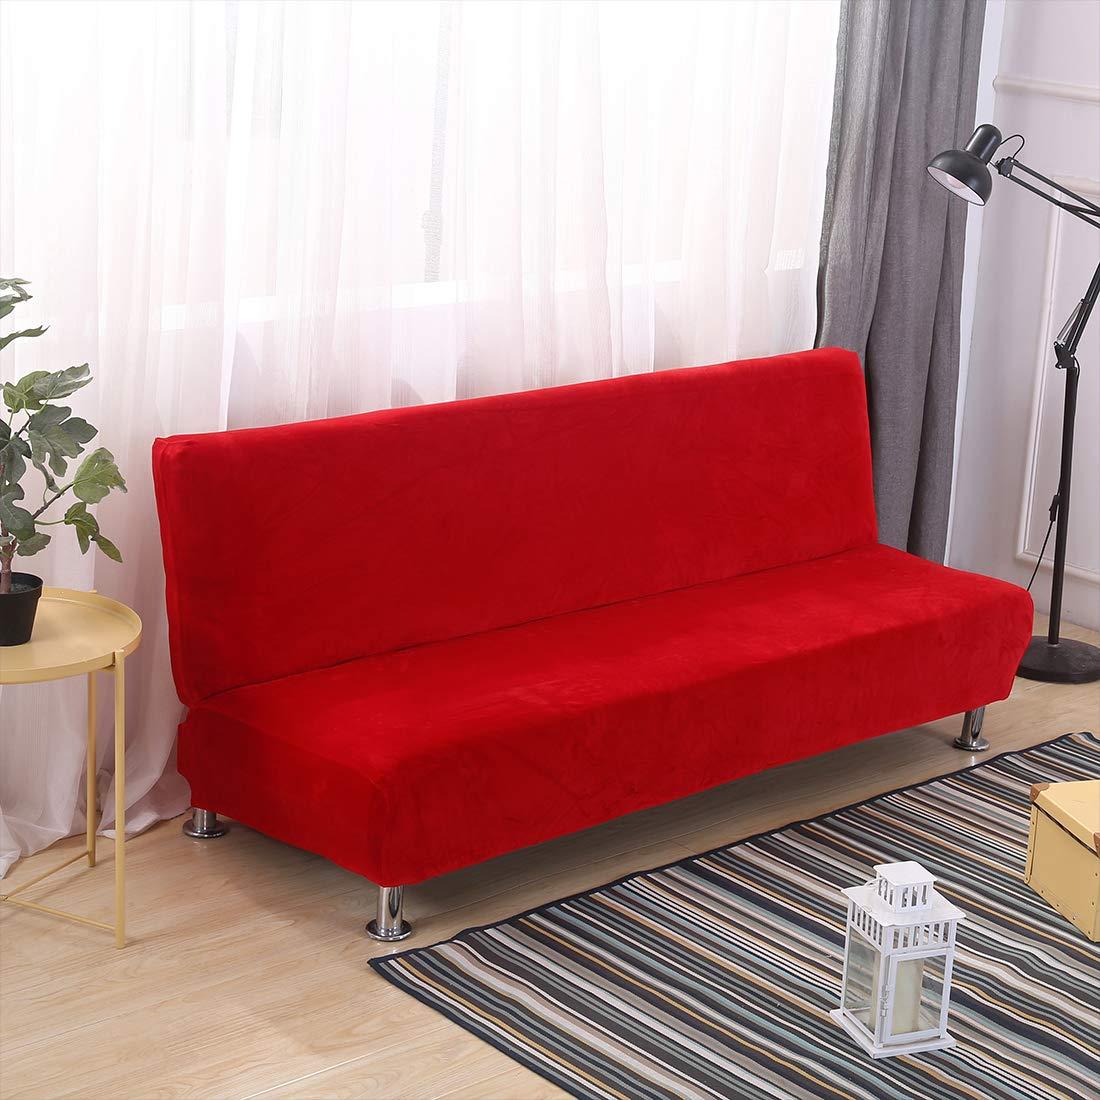 Funda de sofá clic-clac terciopelo epaisse extensible extraíble sin reposabrazos 180 – 210 cm – Funda universal para sofá-cama Stretch para casa ...